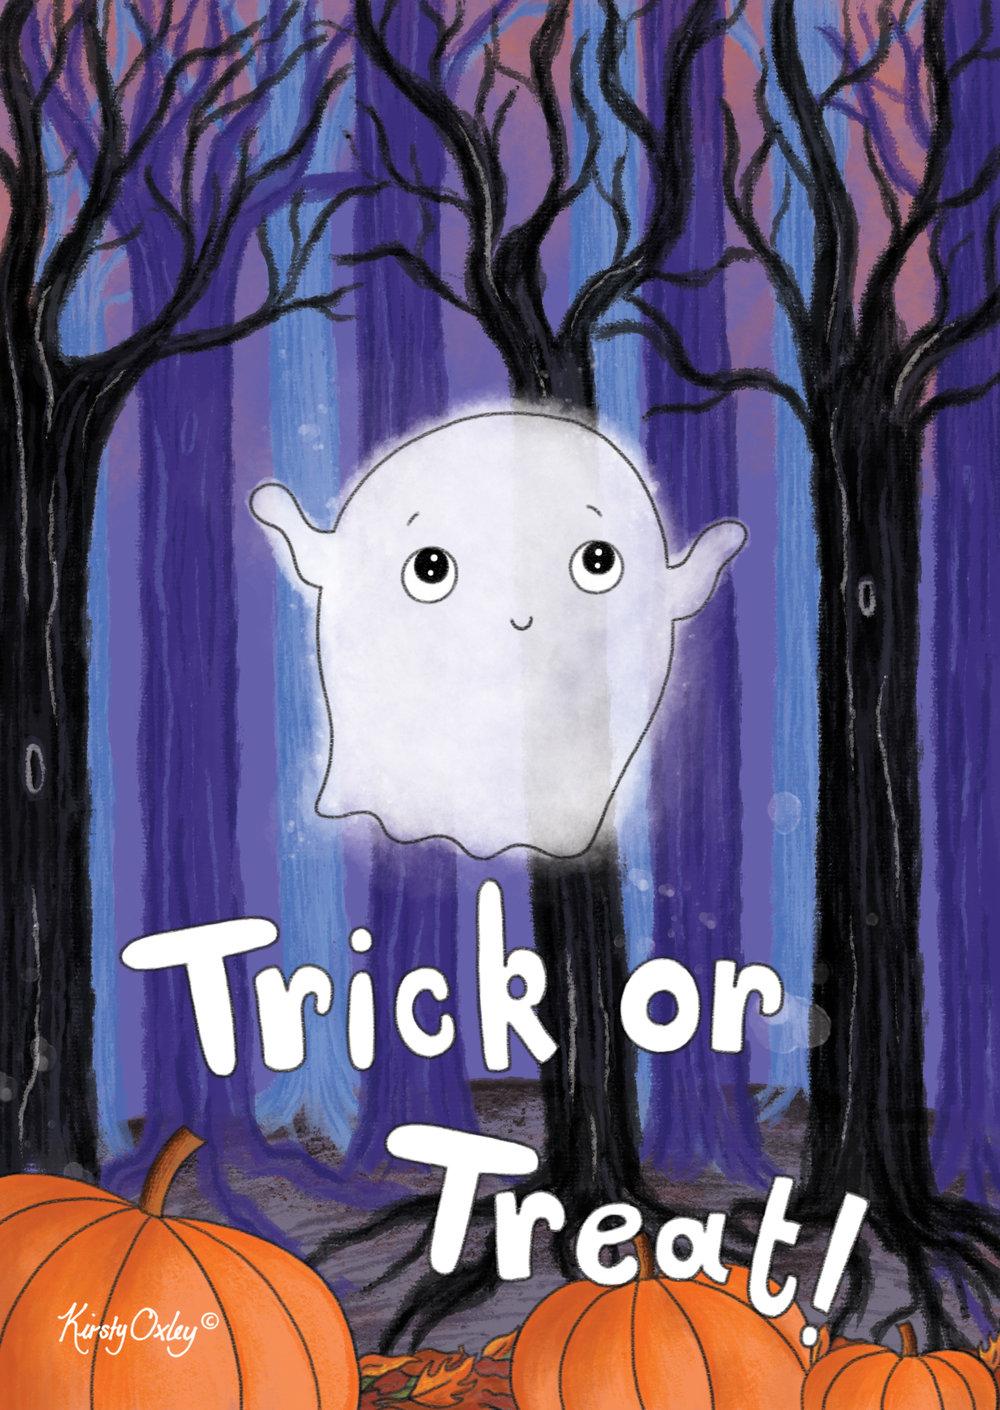 Halloween_ghost_card_Kirsty_Oxley_Illustration.jpg